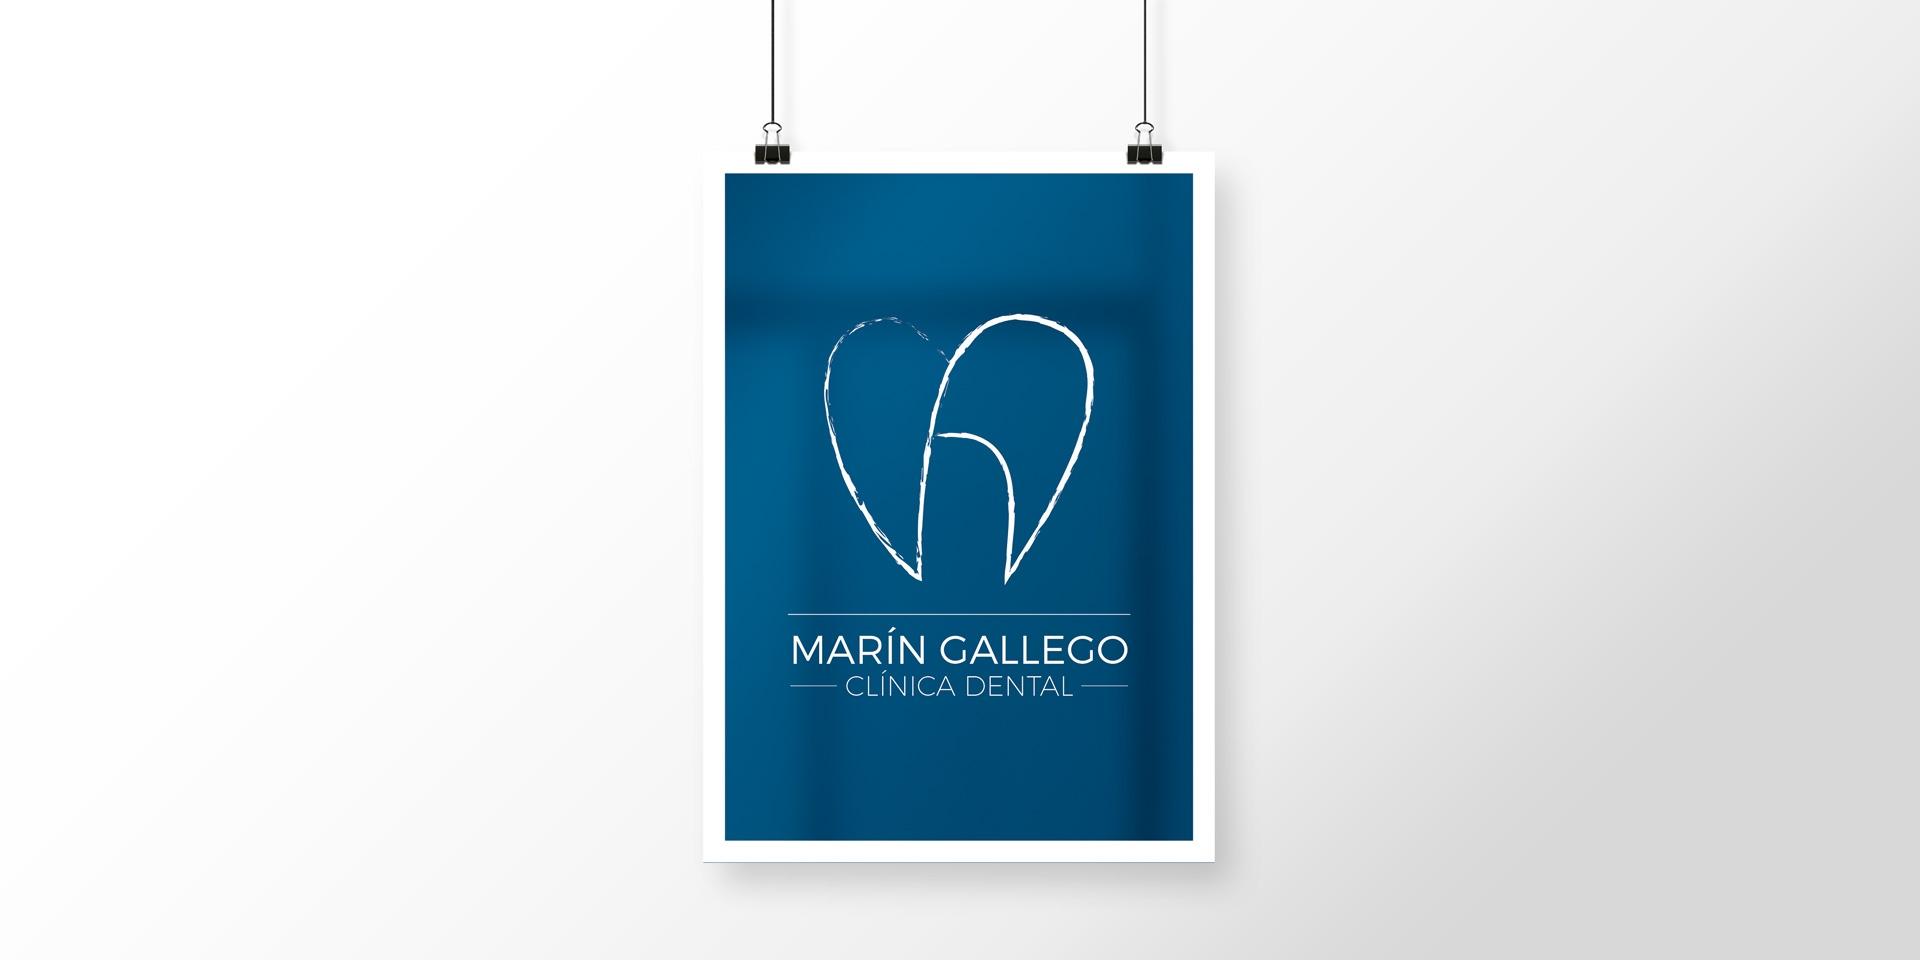 Clínica Dental Marín Gallego